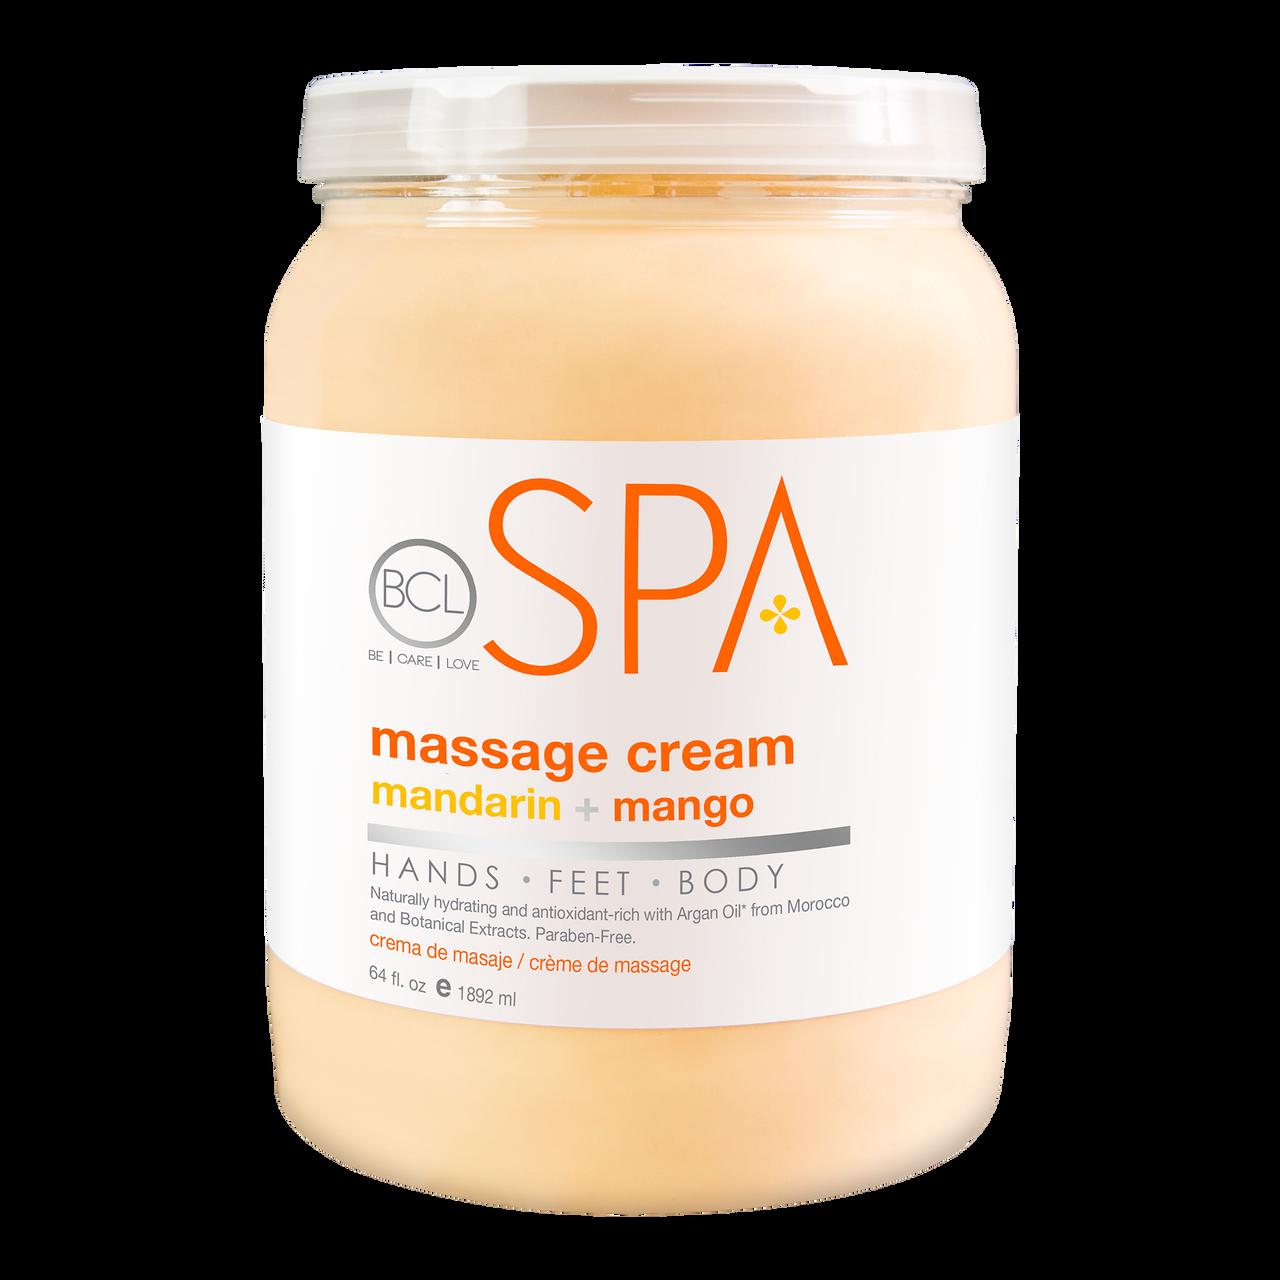 BCL SPA 64 oz. Massage Cream Mandarin + Mango